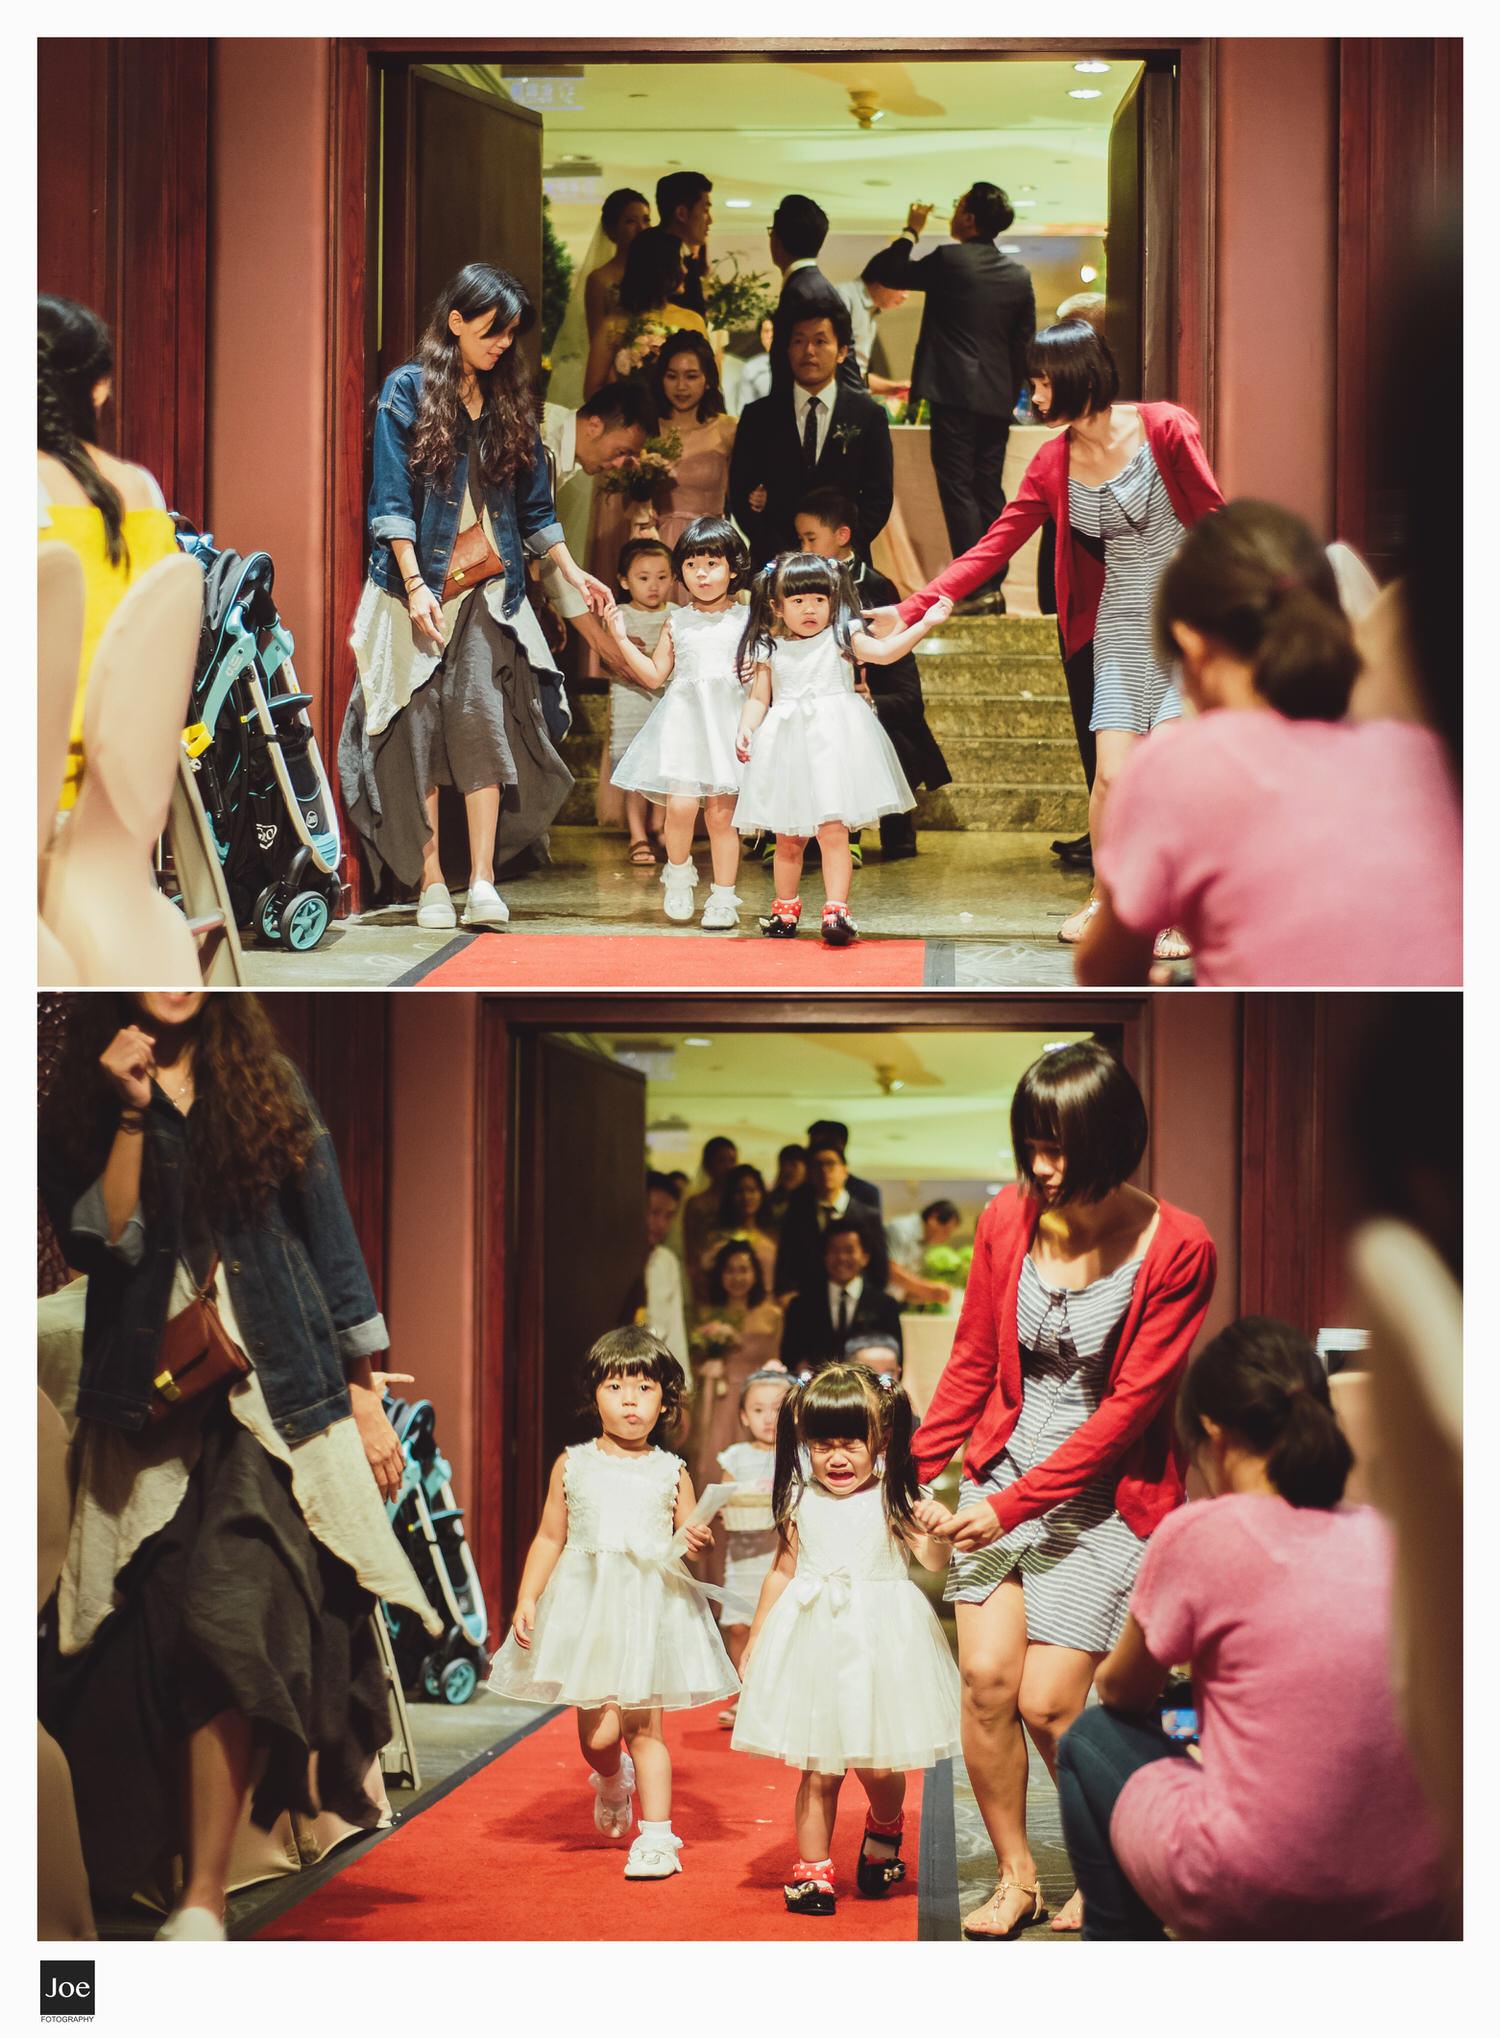 wedding-photography-shangri-la-far-eastern-plaza-hotel-ariel-sam-joe-fotography-138.jpg